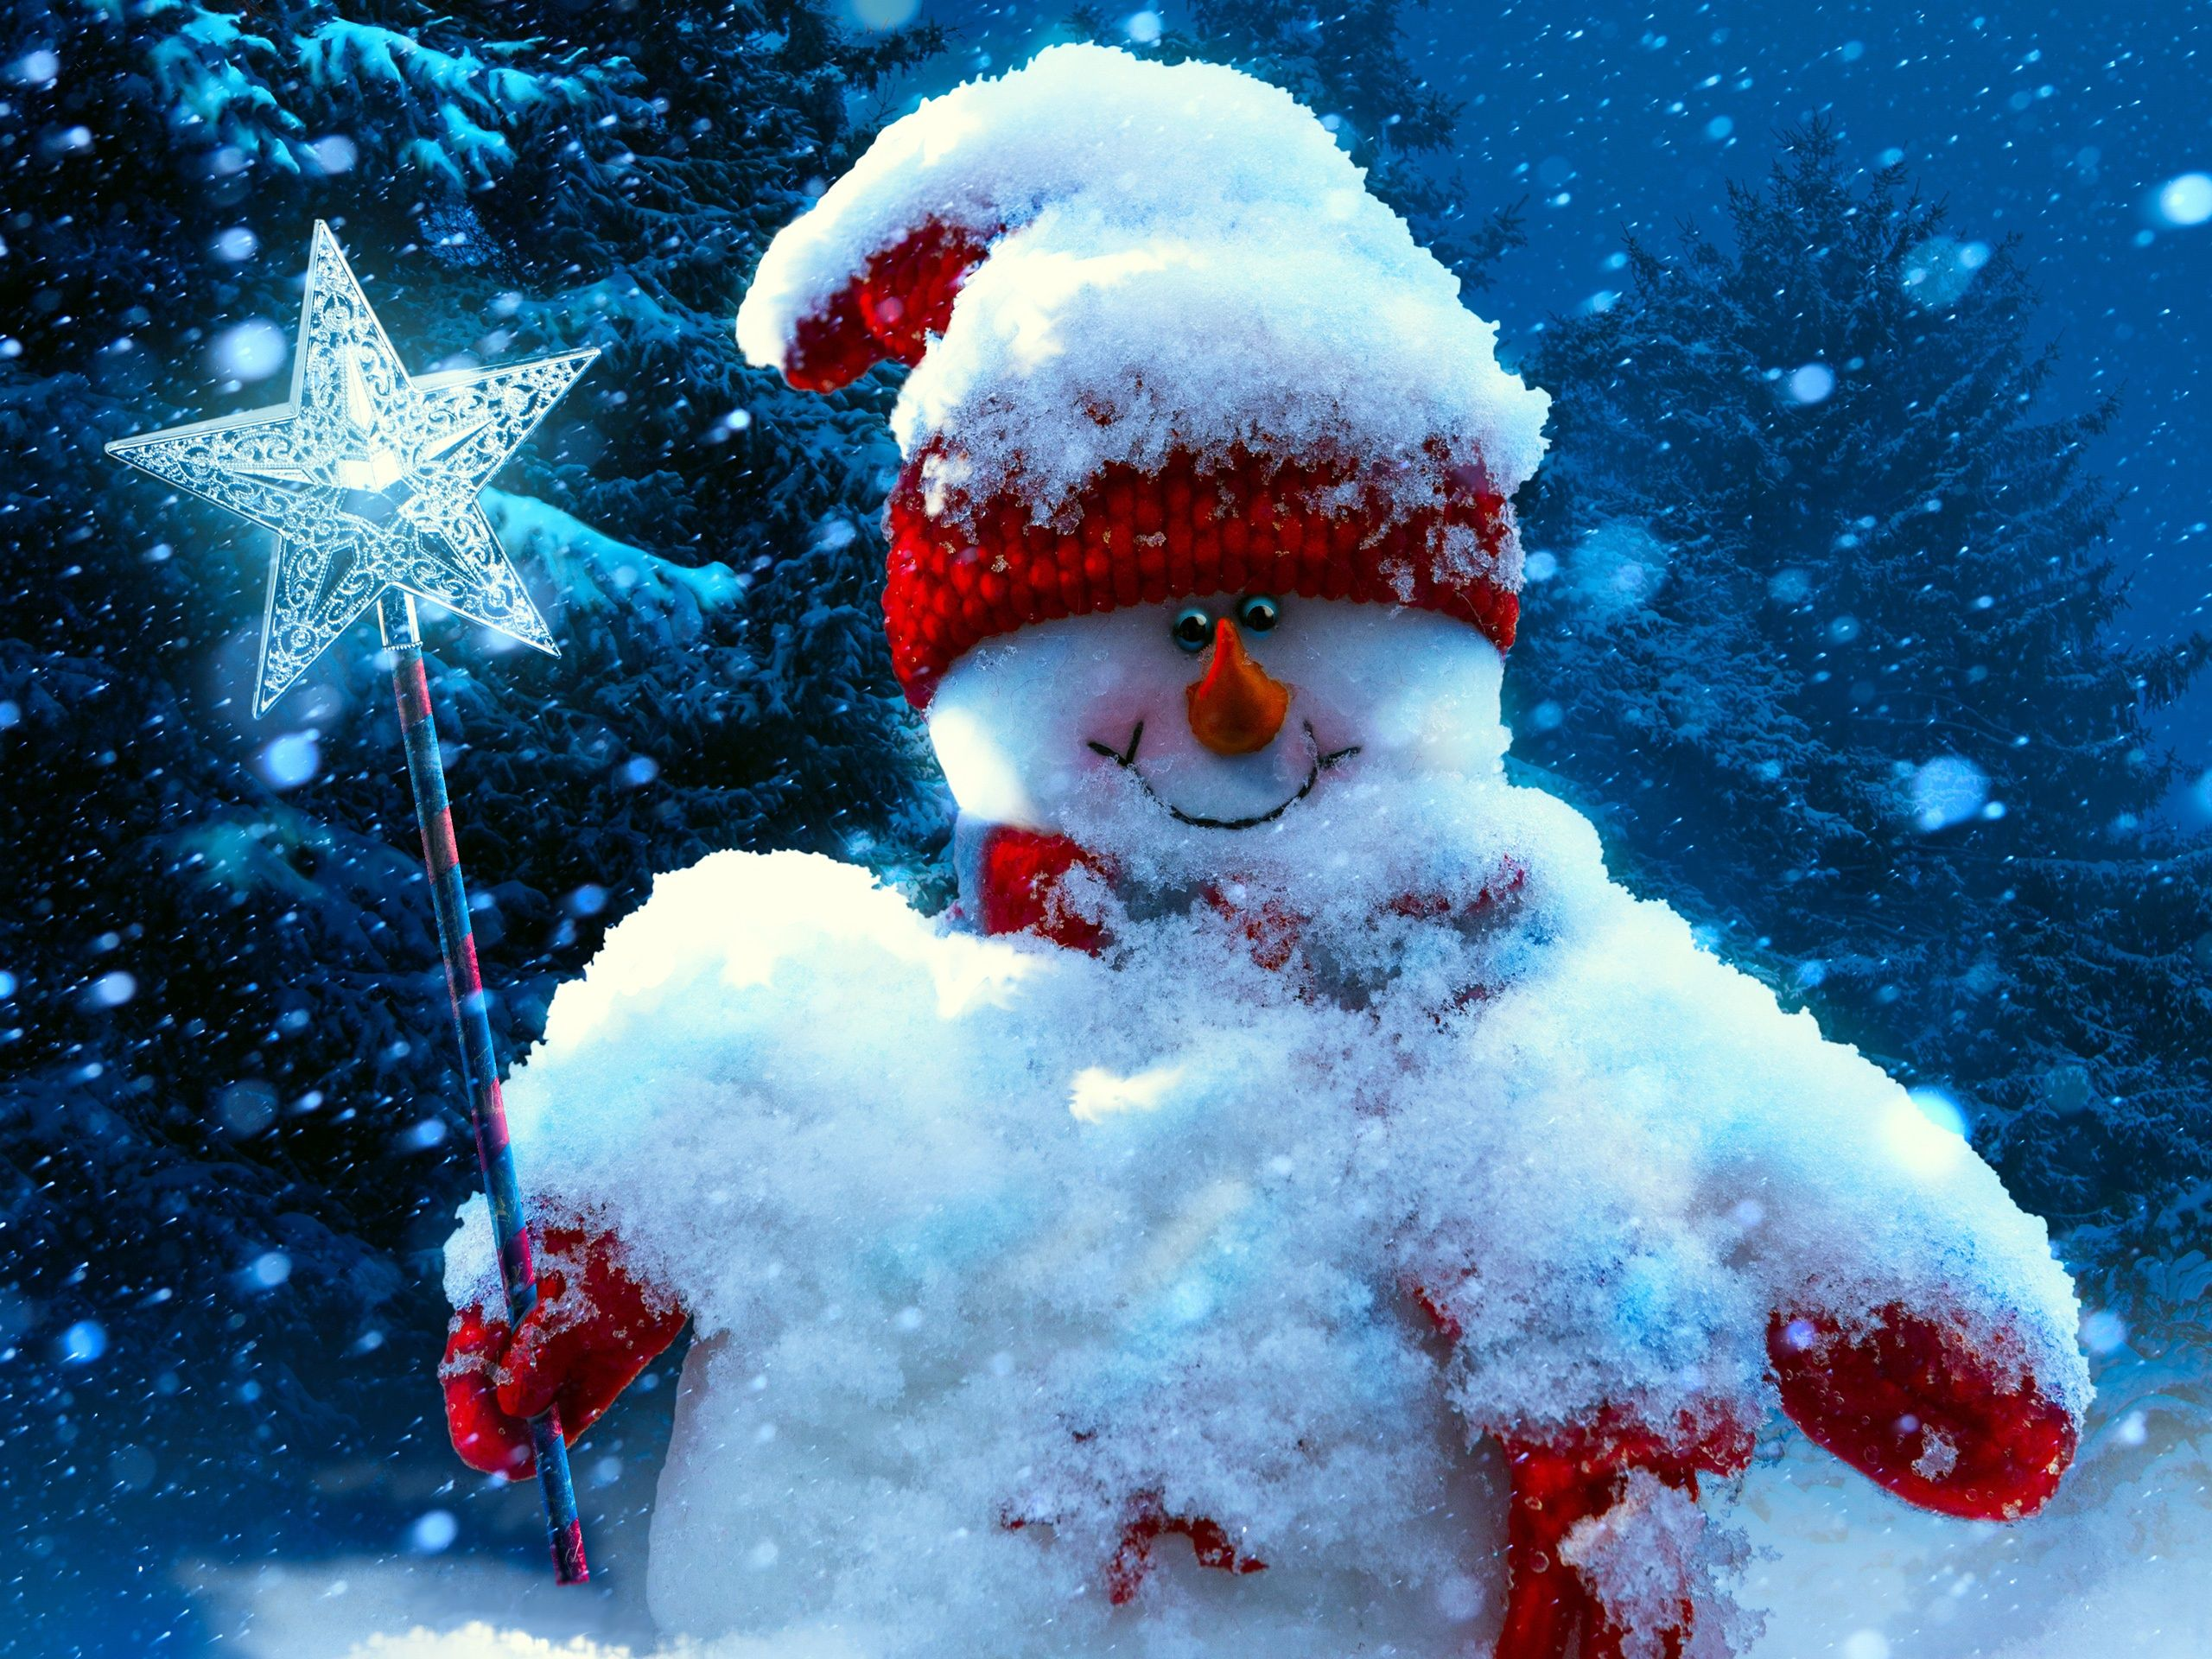 Noel Nouvel An Bonhomme De Neige Hiver Fonds D Ecran 2560x1920 Bonhomme De Neige Bonhomme De Neige De Noel Noel